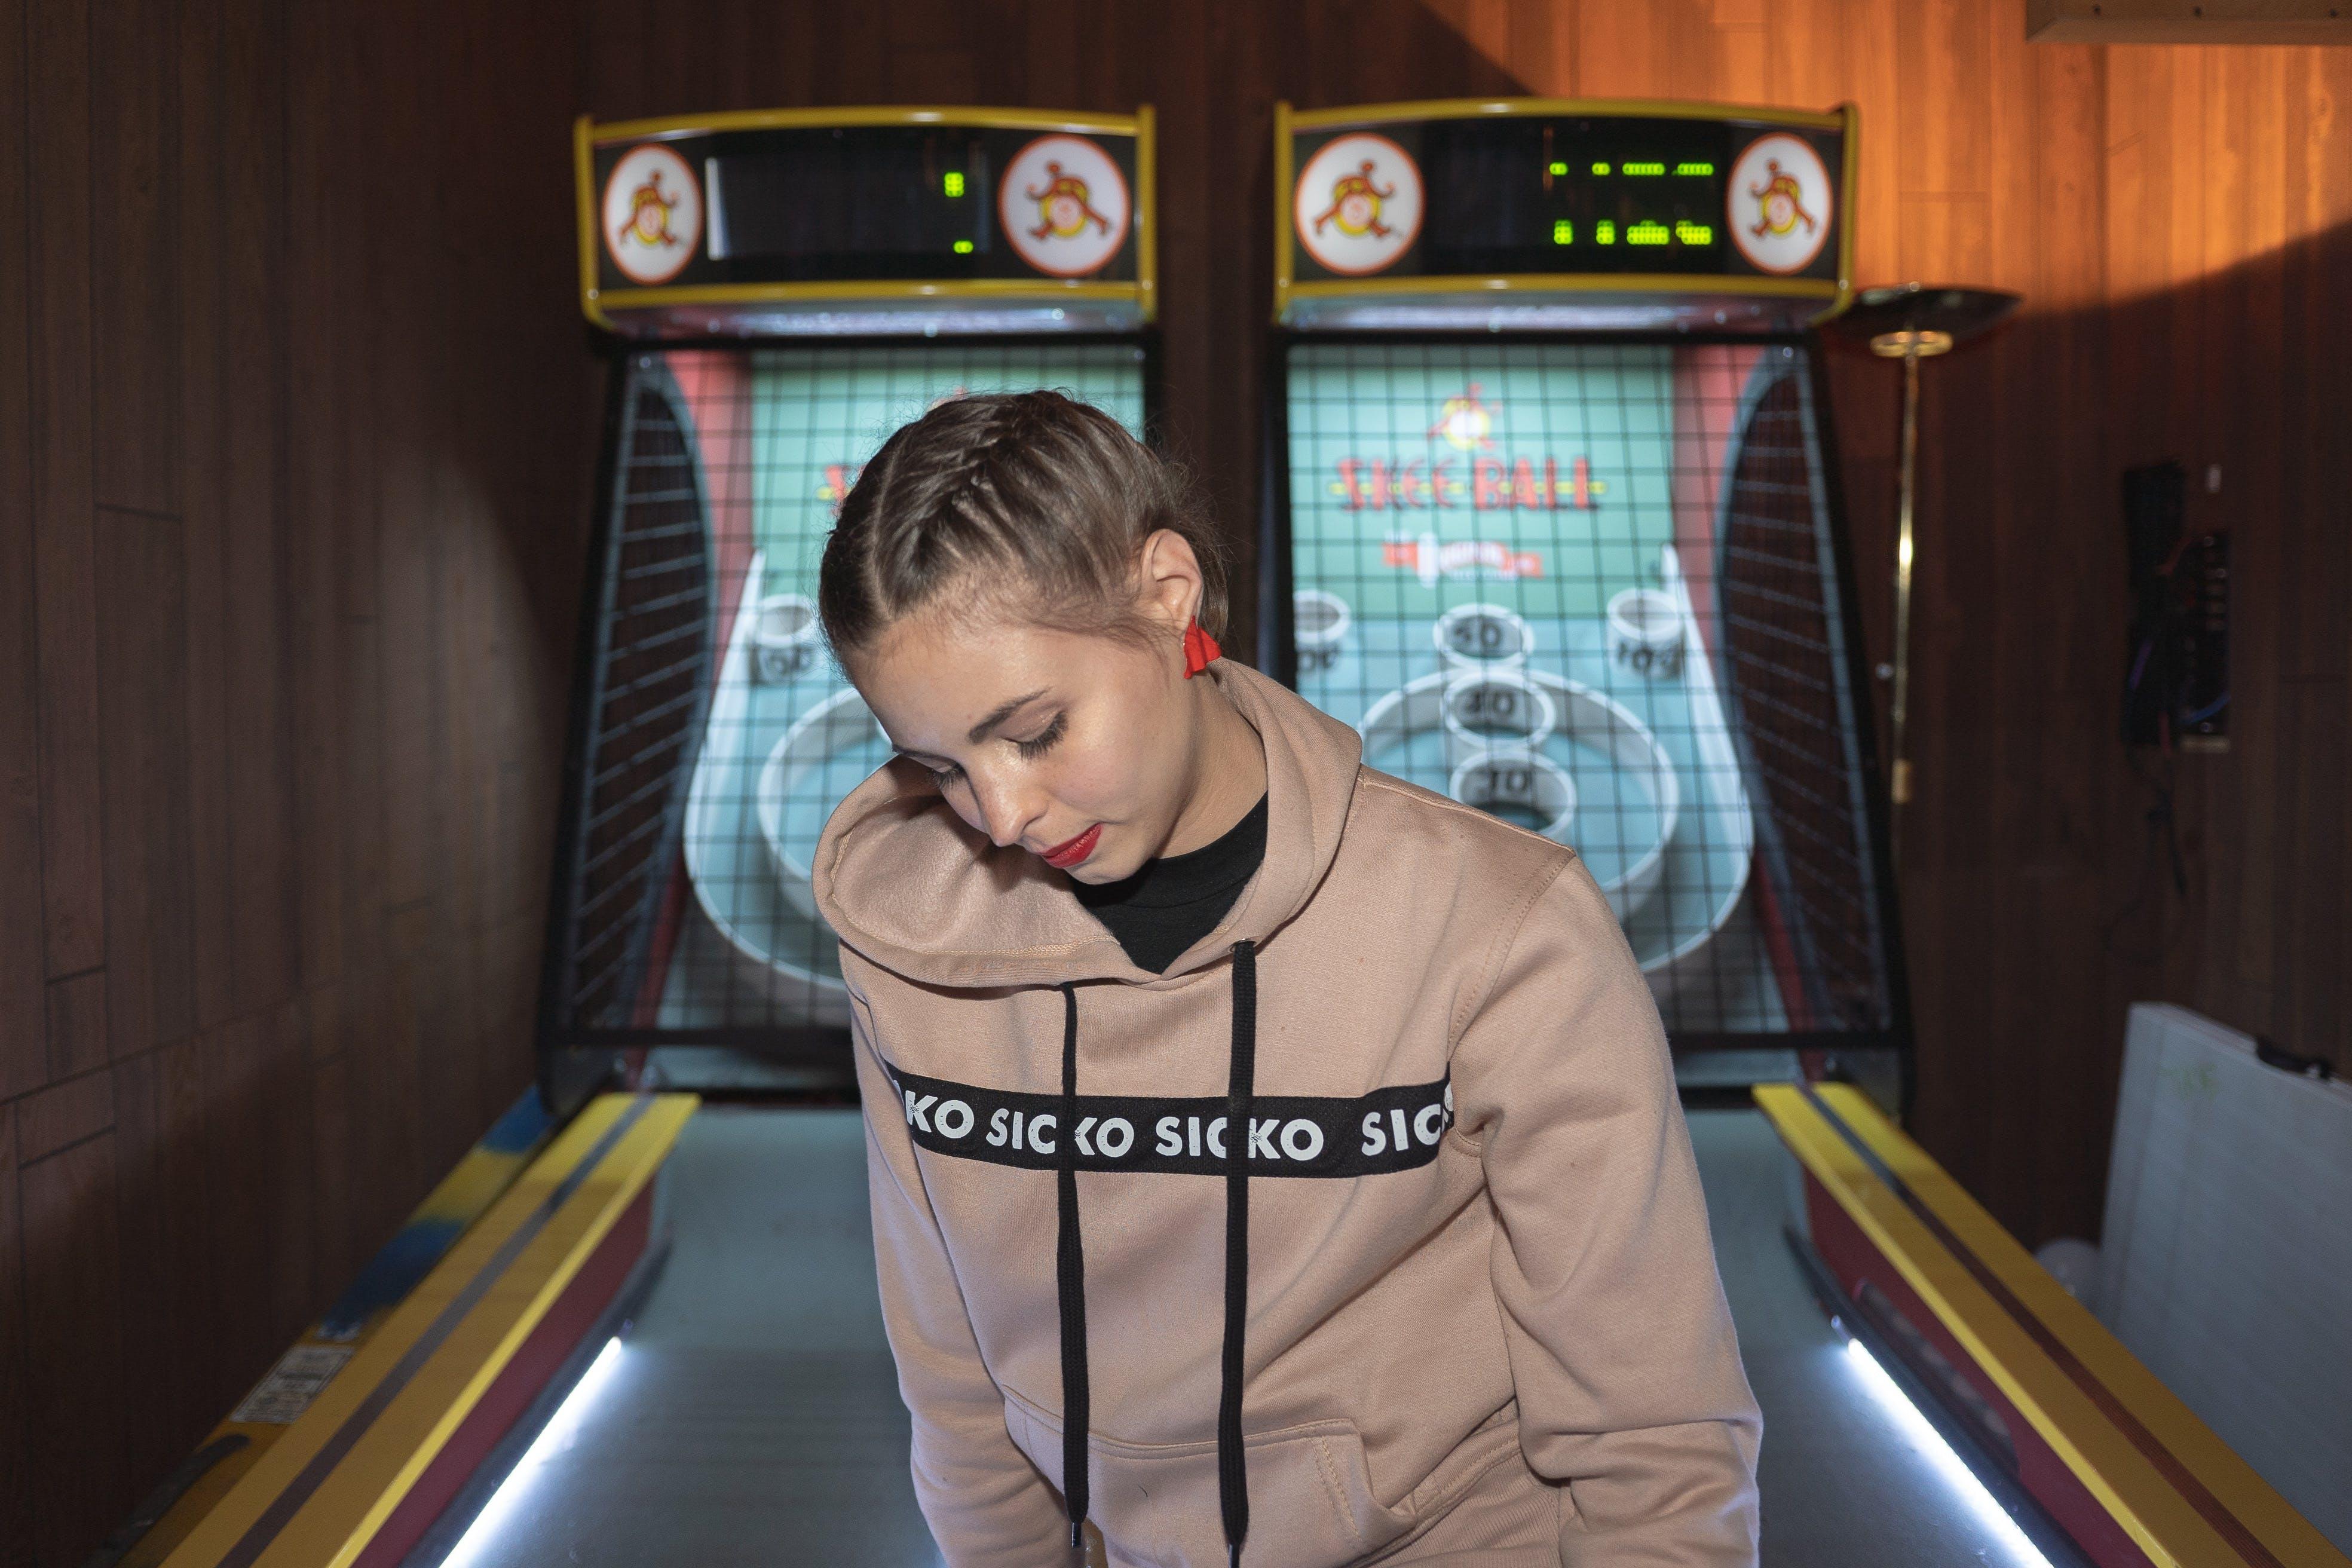 Woman Near Maze Arcade Machine